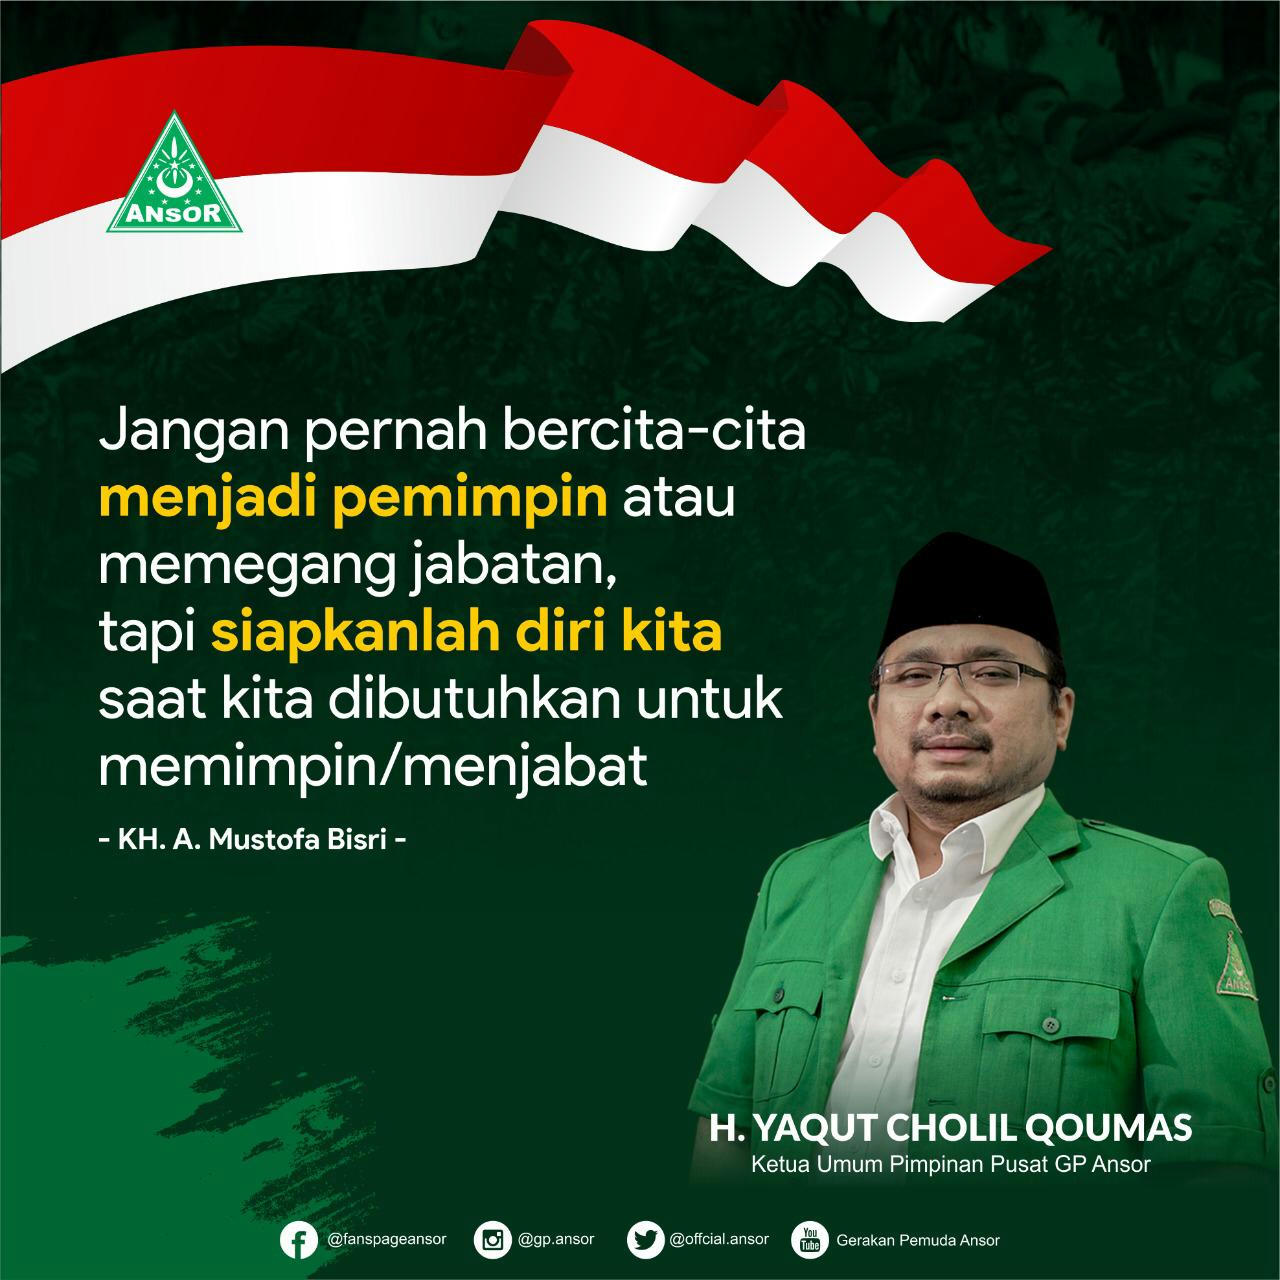 Presiden Jokowi Tunjuk Gus Yaqut Jadi Menteri Agama